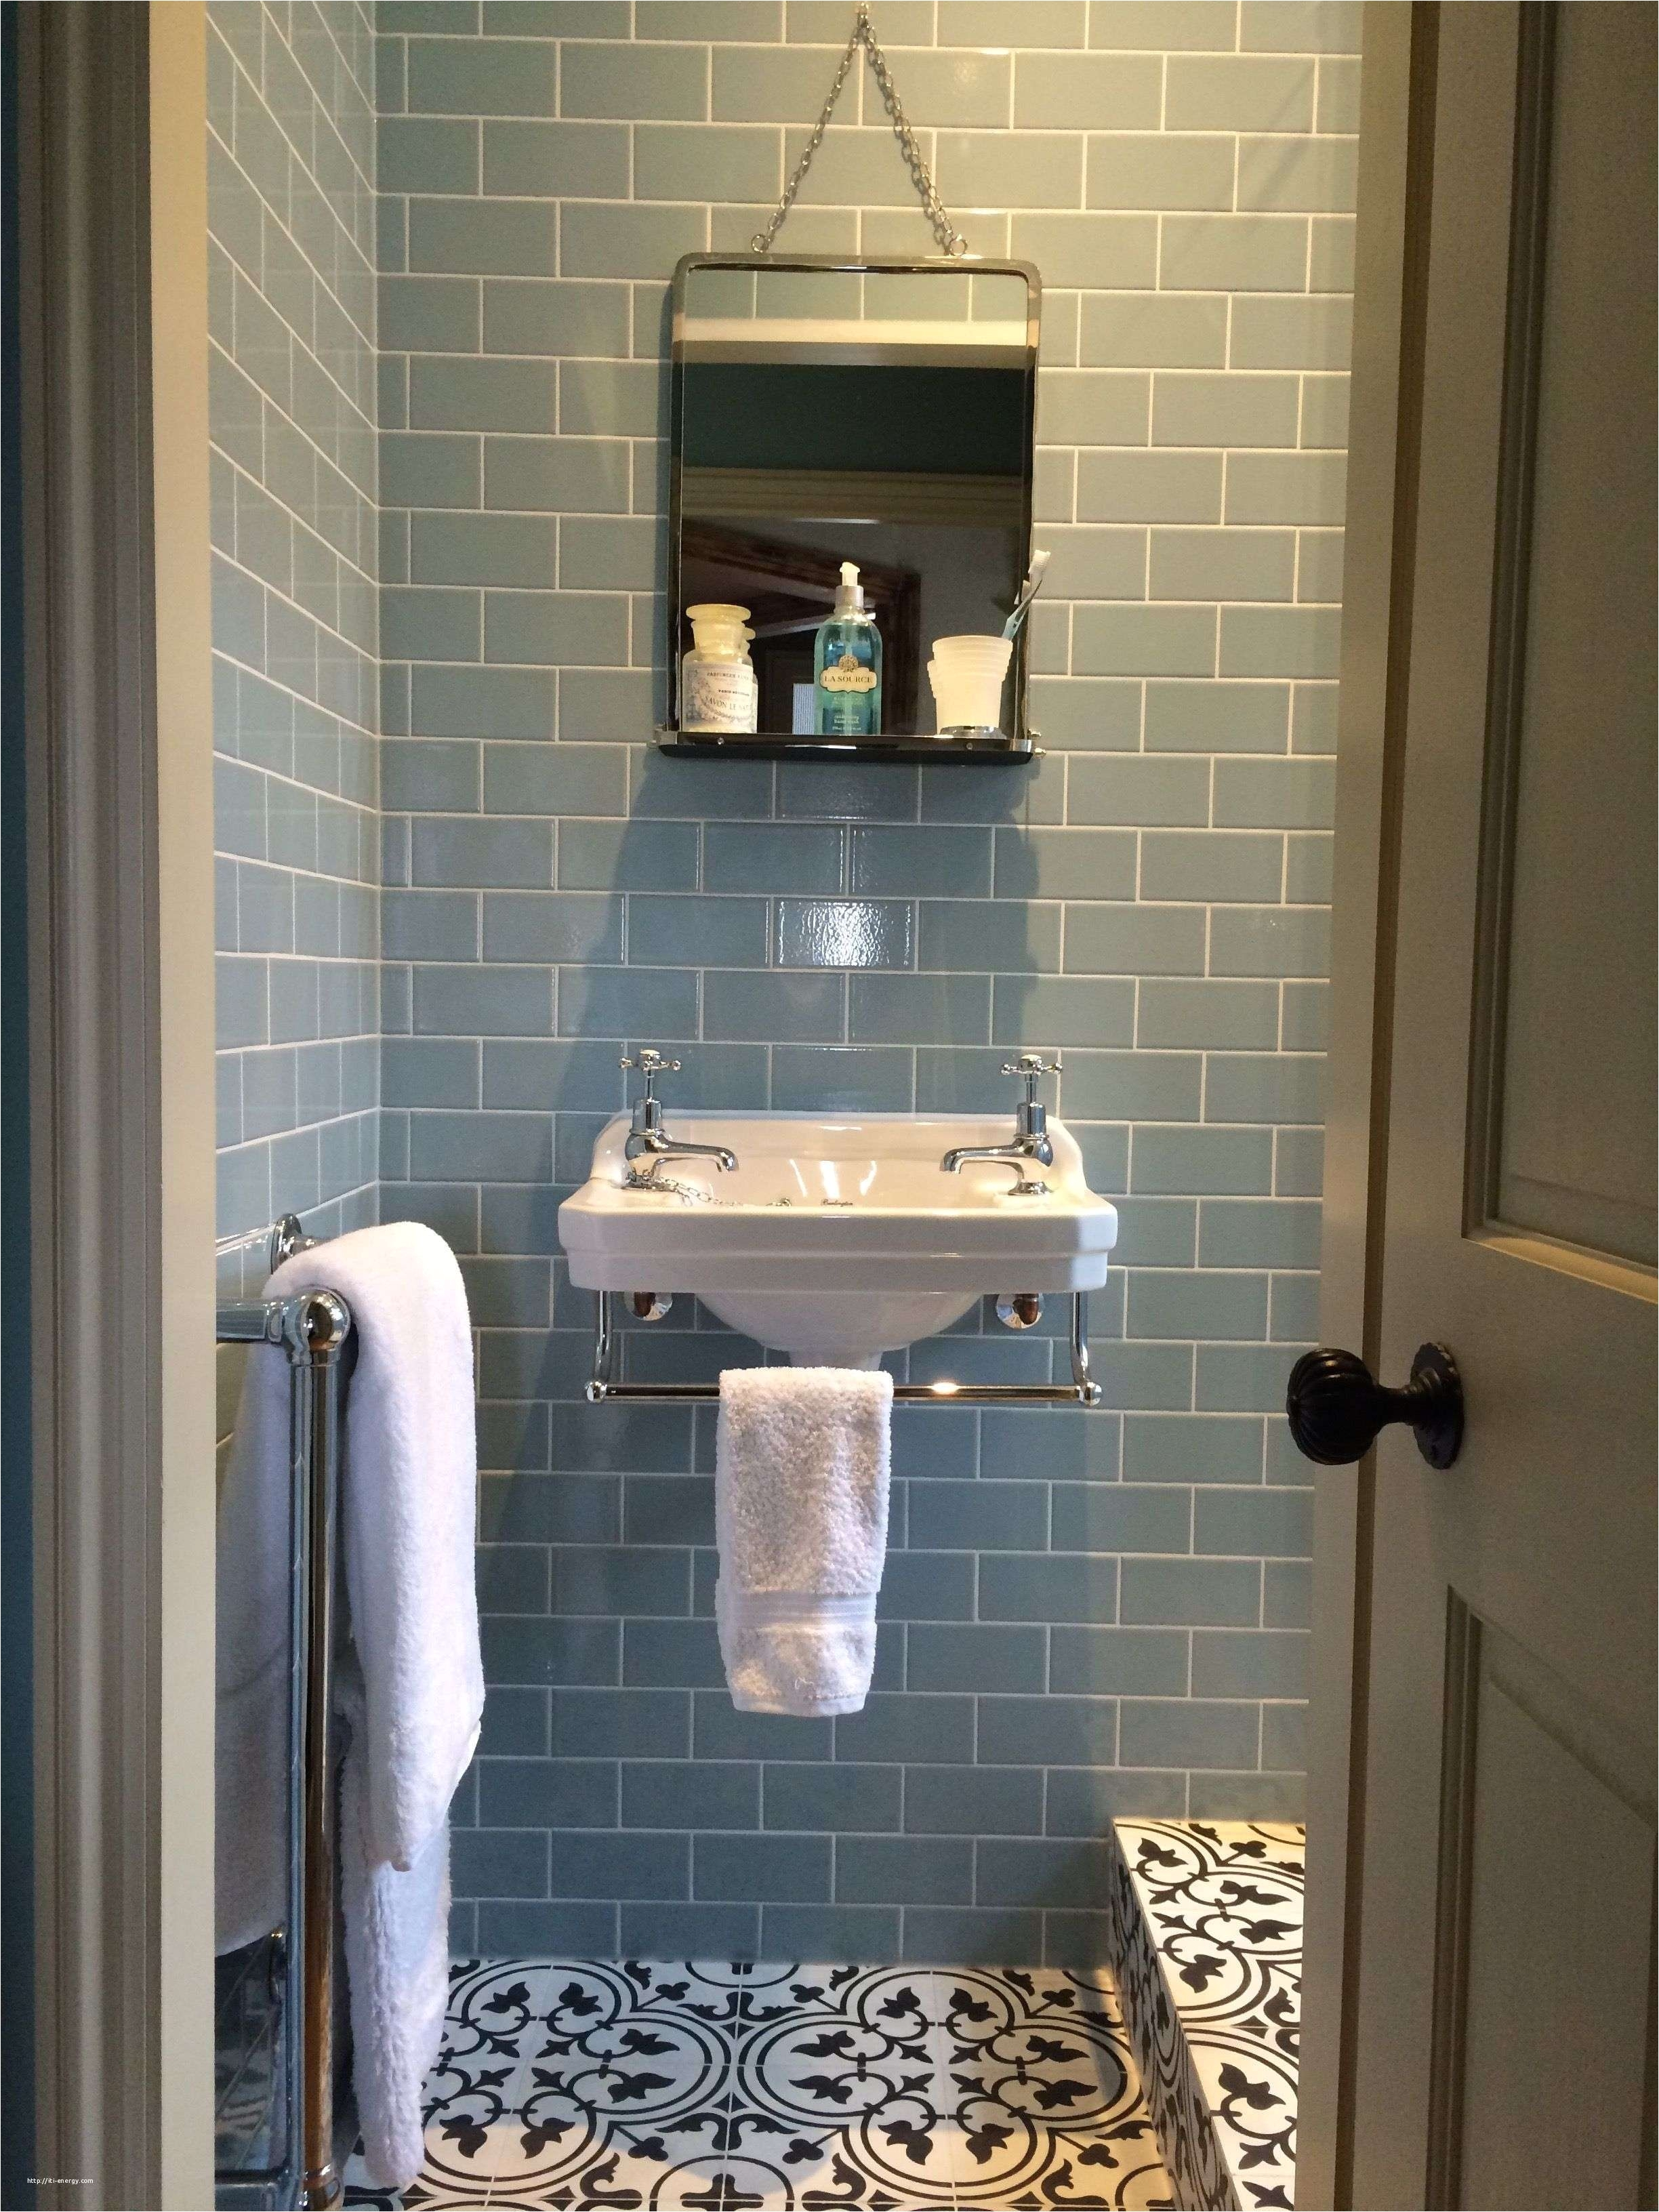 Traditional Bathroom Design Ideas Photos Unique Bathrooms Designs Bathroom Ideas